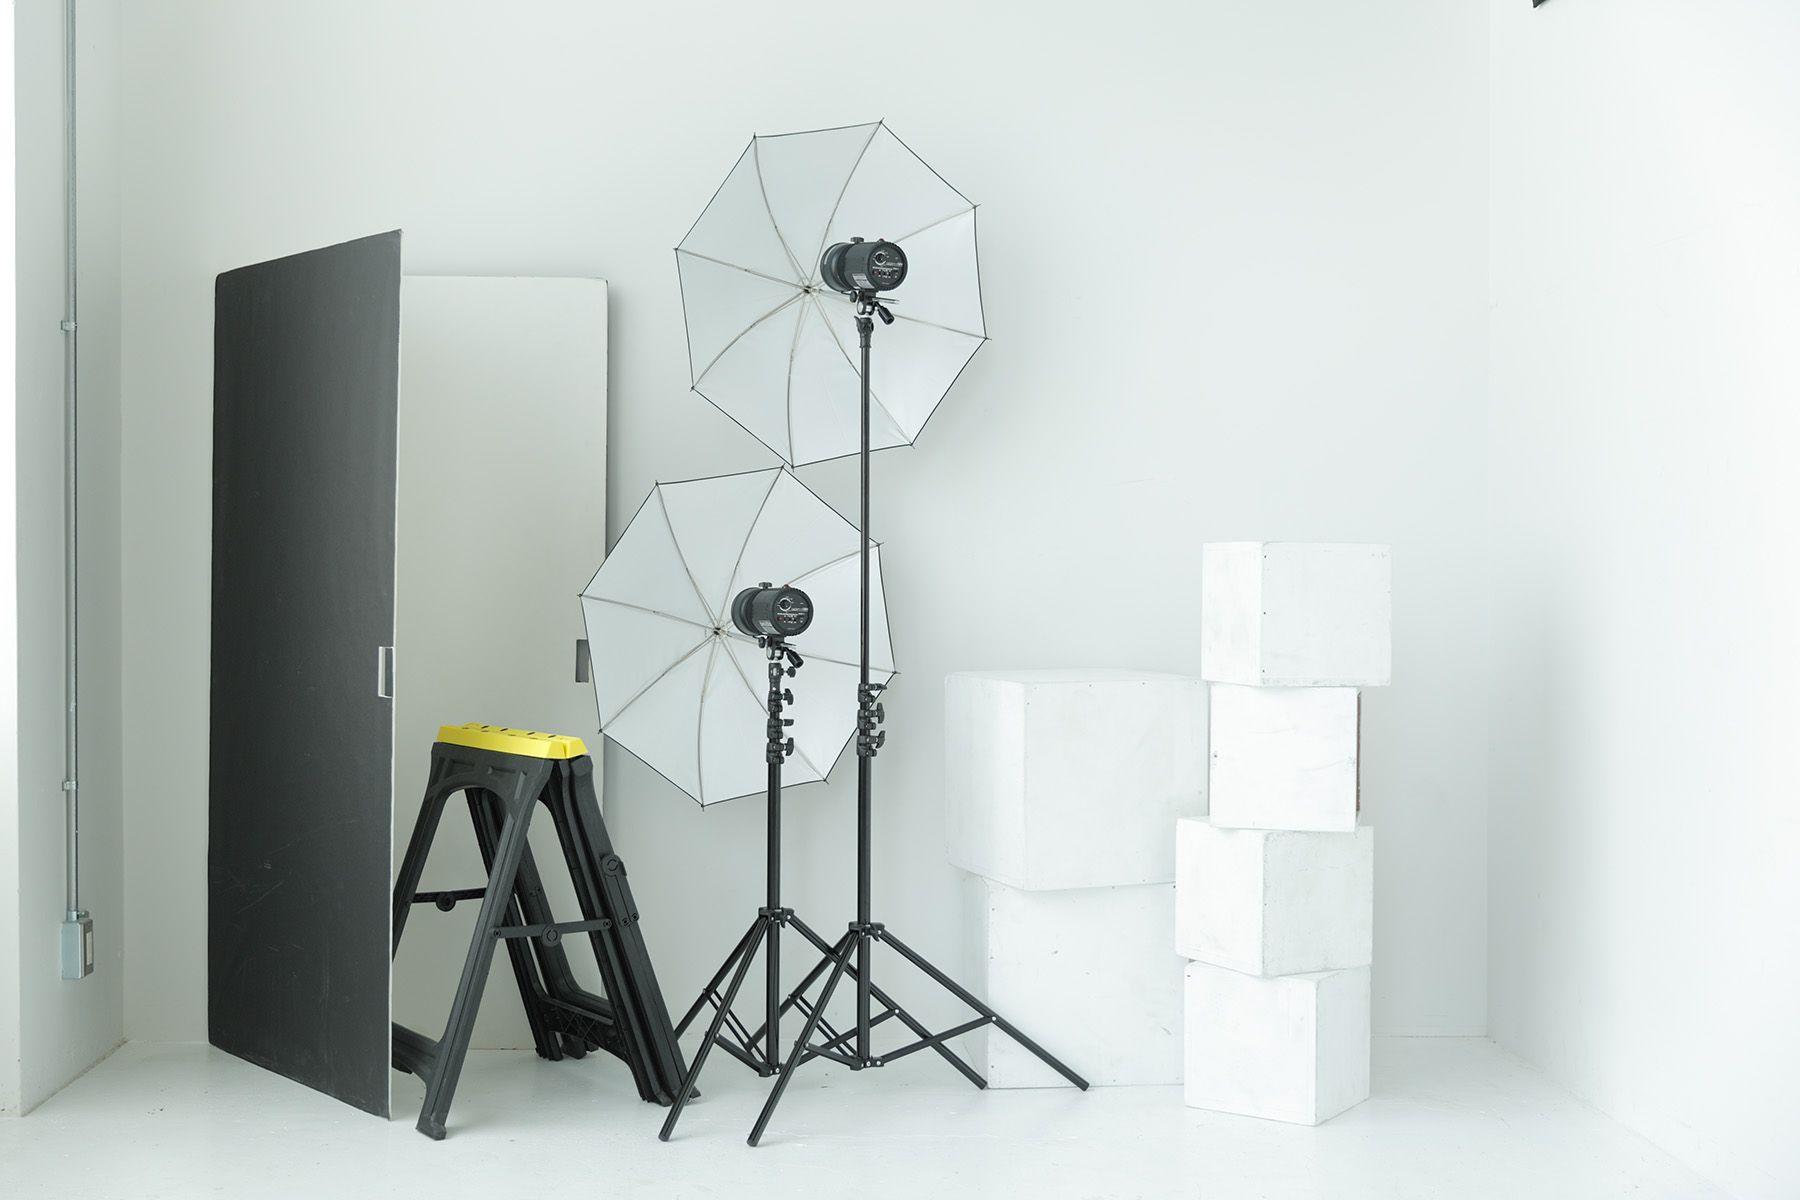 Studio Roaster (スタジオ ロースター)equipment